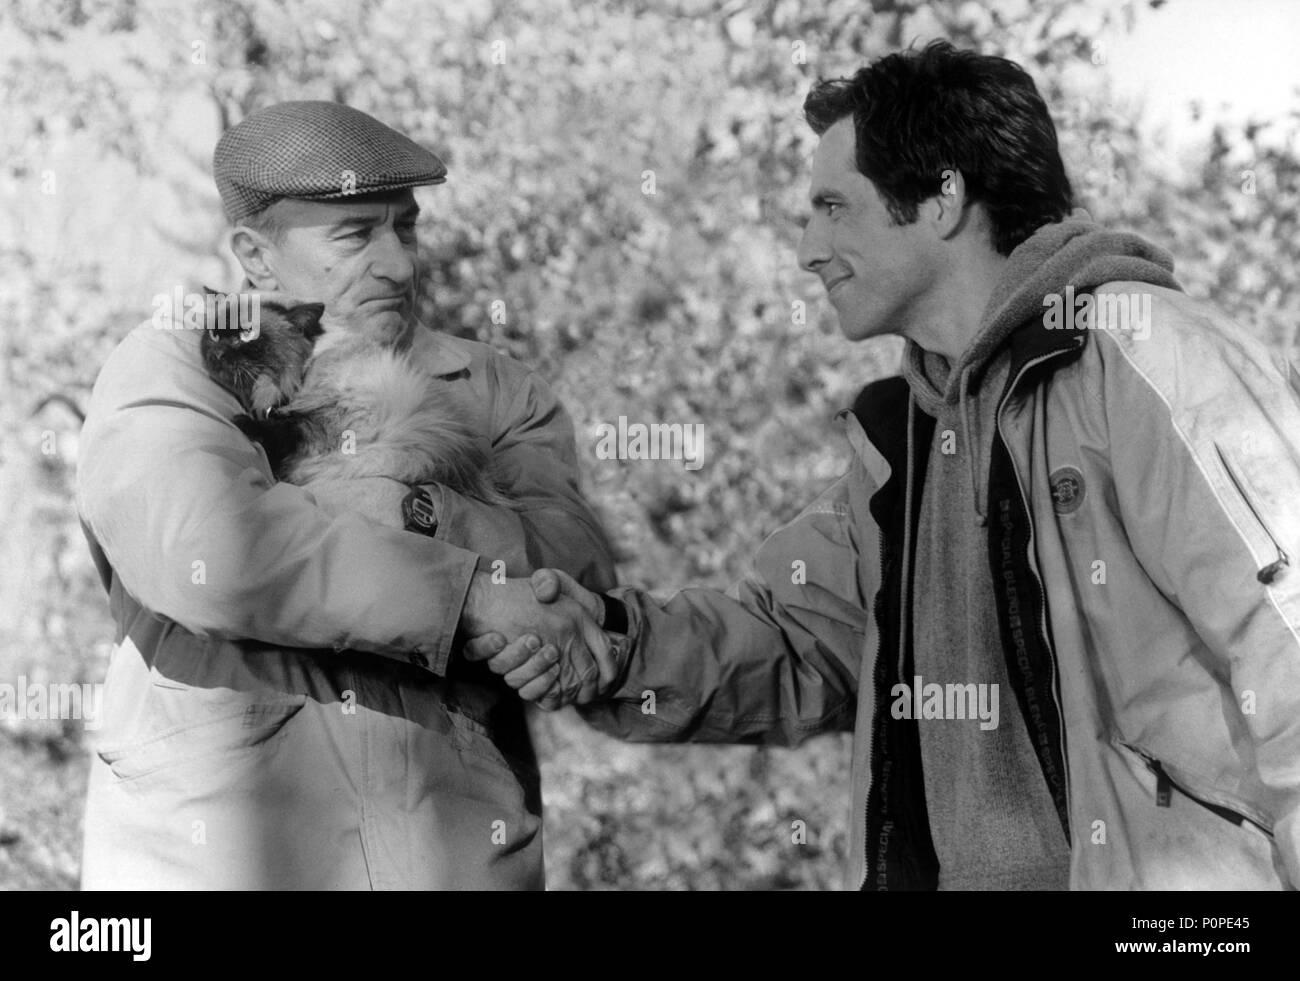 Original Film Title: MEET THE PARENTS.  English Title: MEET THE PARENTS.  Film Director: M. JAY ROACH.  Year: 2000.  Stars: BEN STILLER; ROBERT DE NIRO. Credit: UNIVERSAL / Album - Stock Image